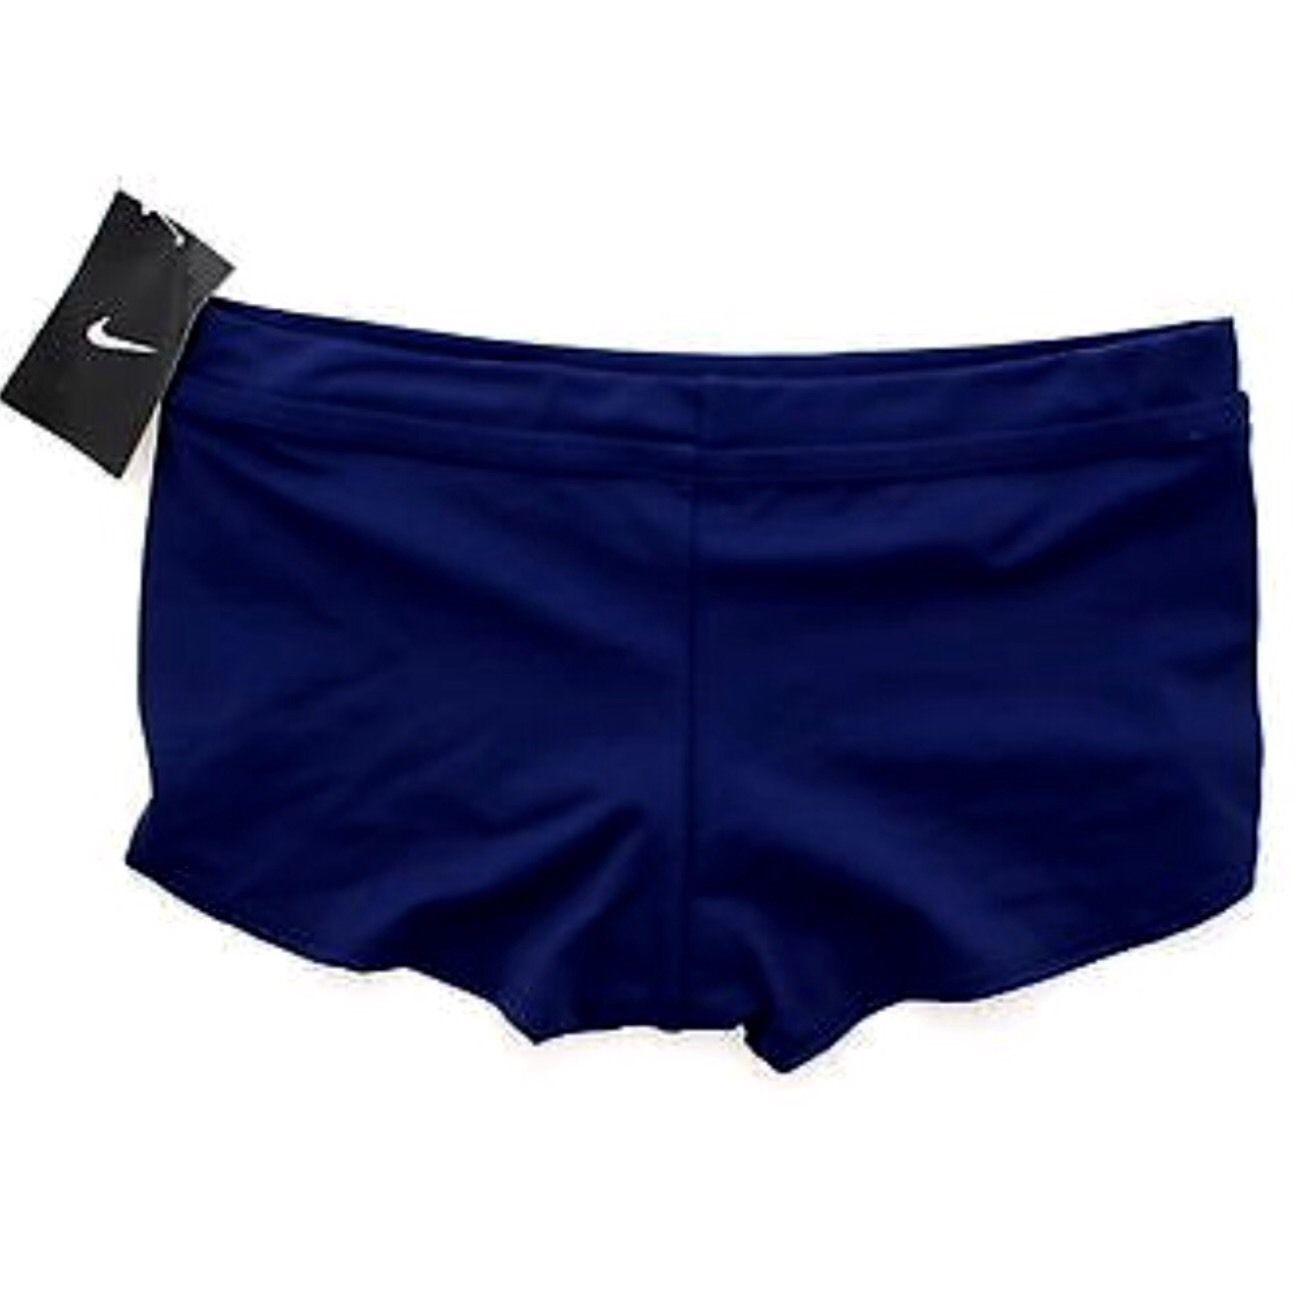 Nike Swimwear Core Bottom Boyshort Swimsuit Bikini (12) Training $40 CLEARANCE